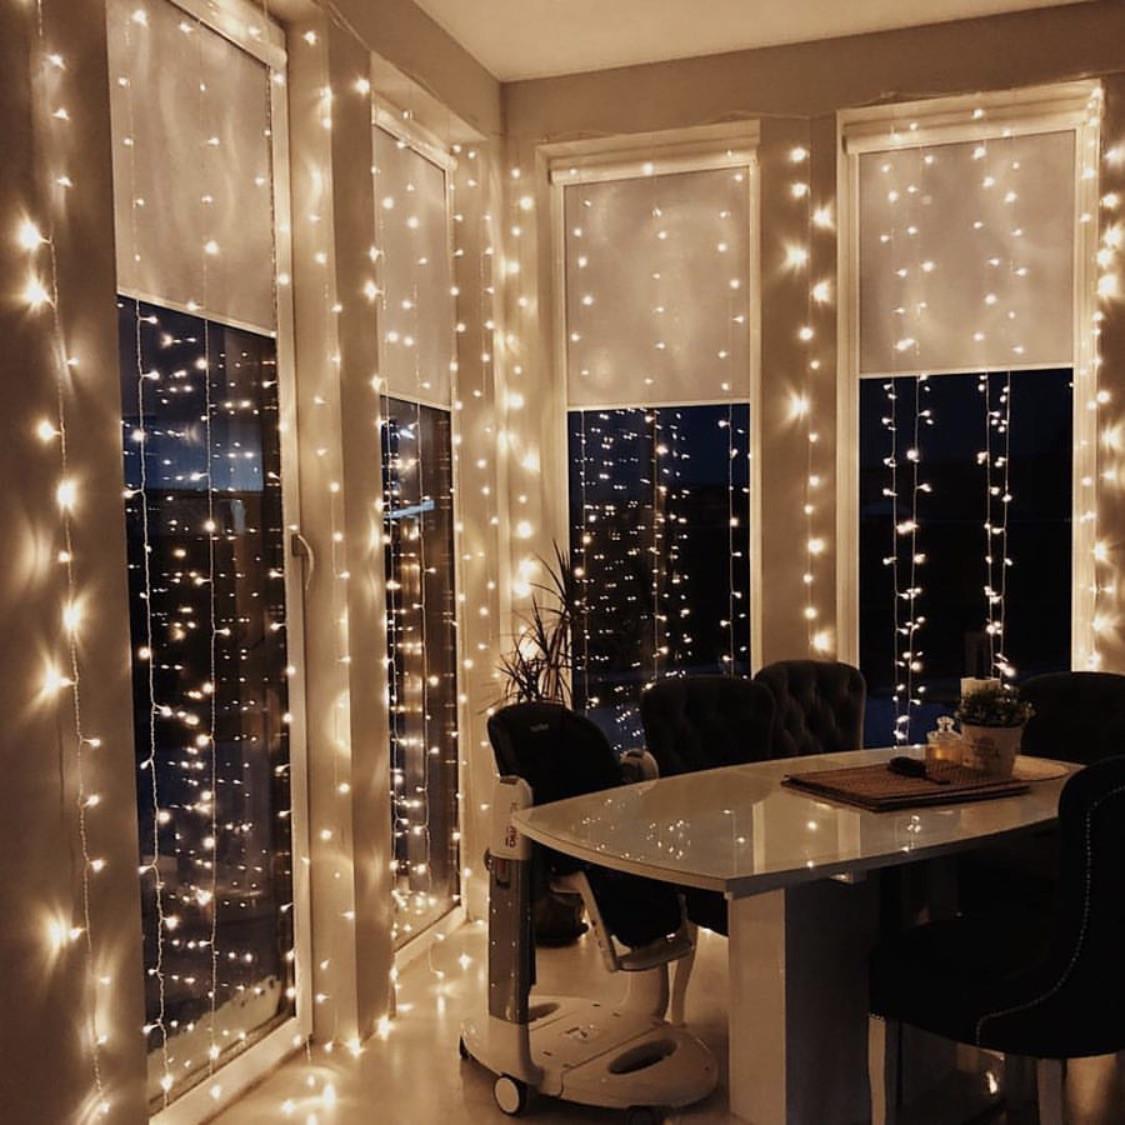 Гирлянда Штора 3м х 3м 500 LED, 8 режимов + статический режим.